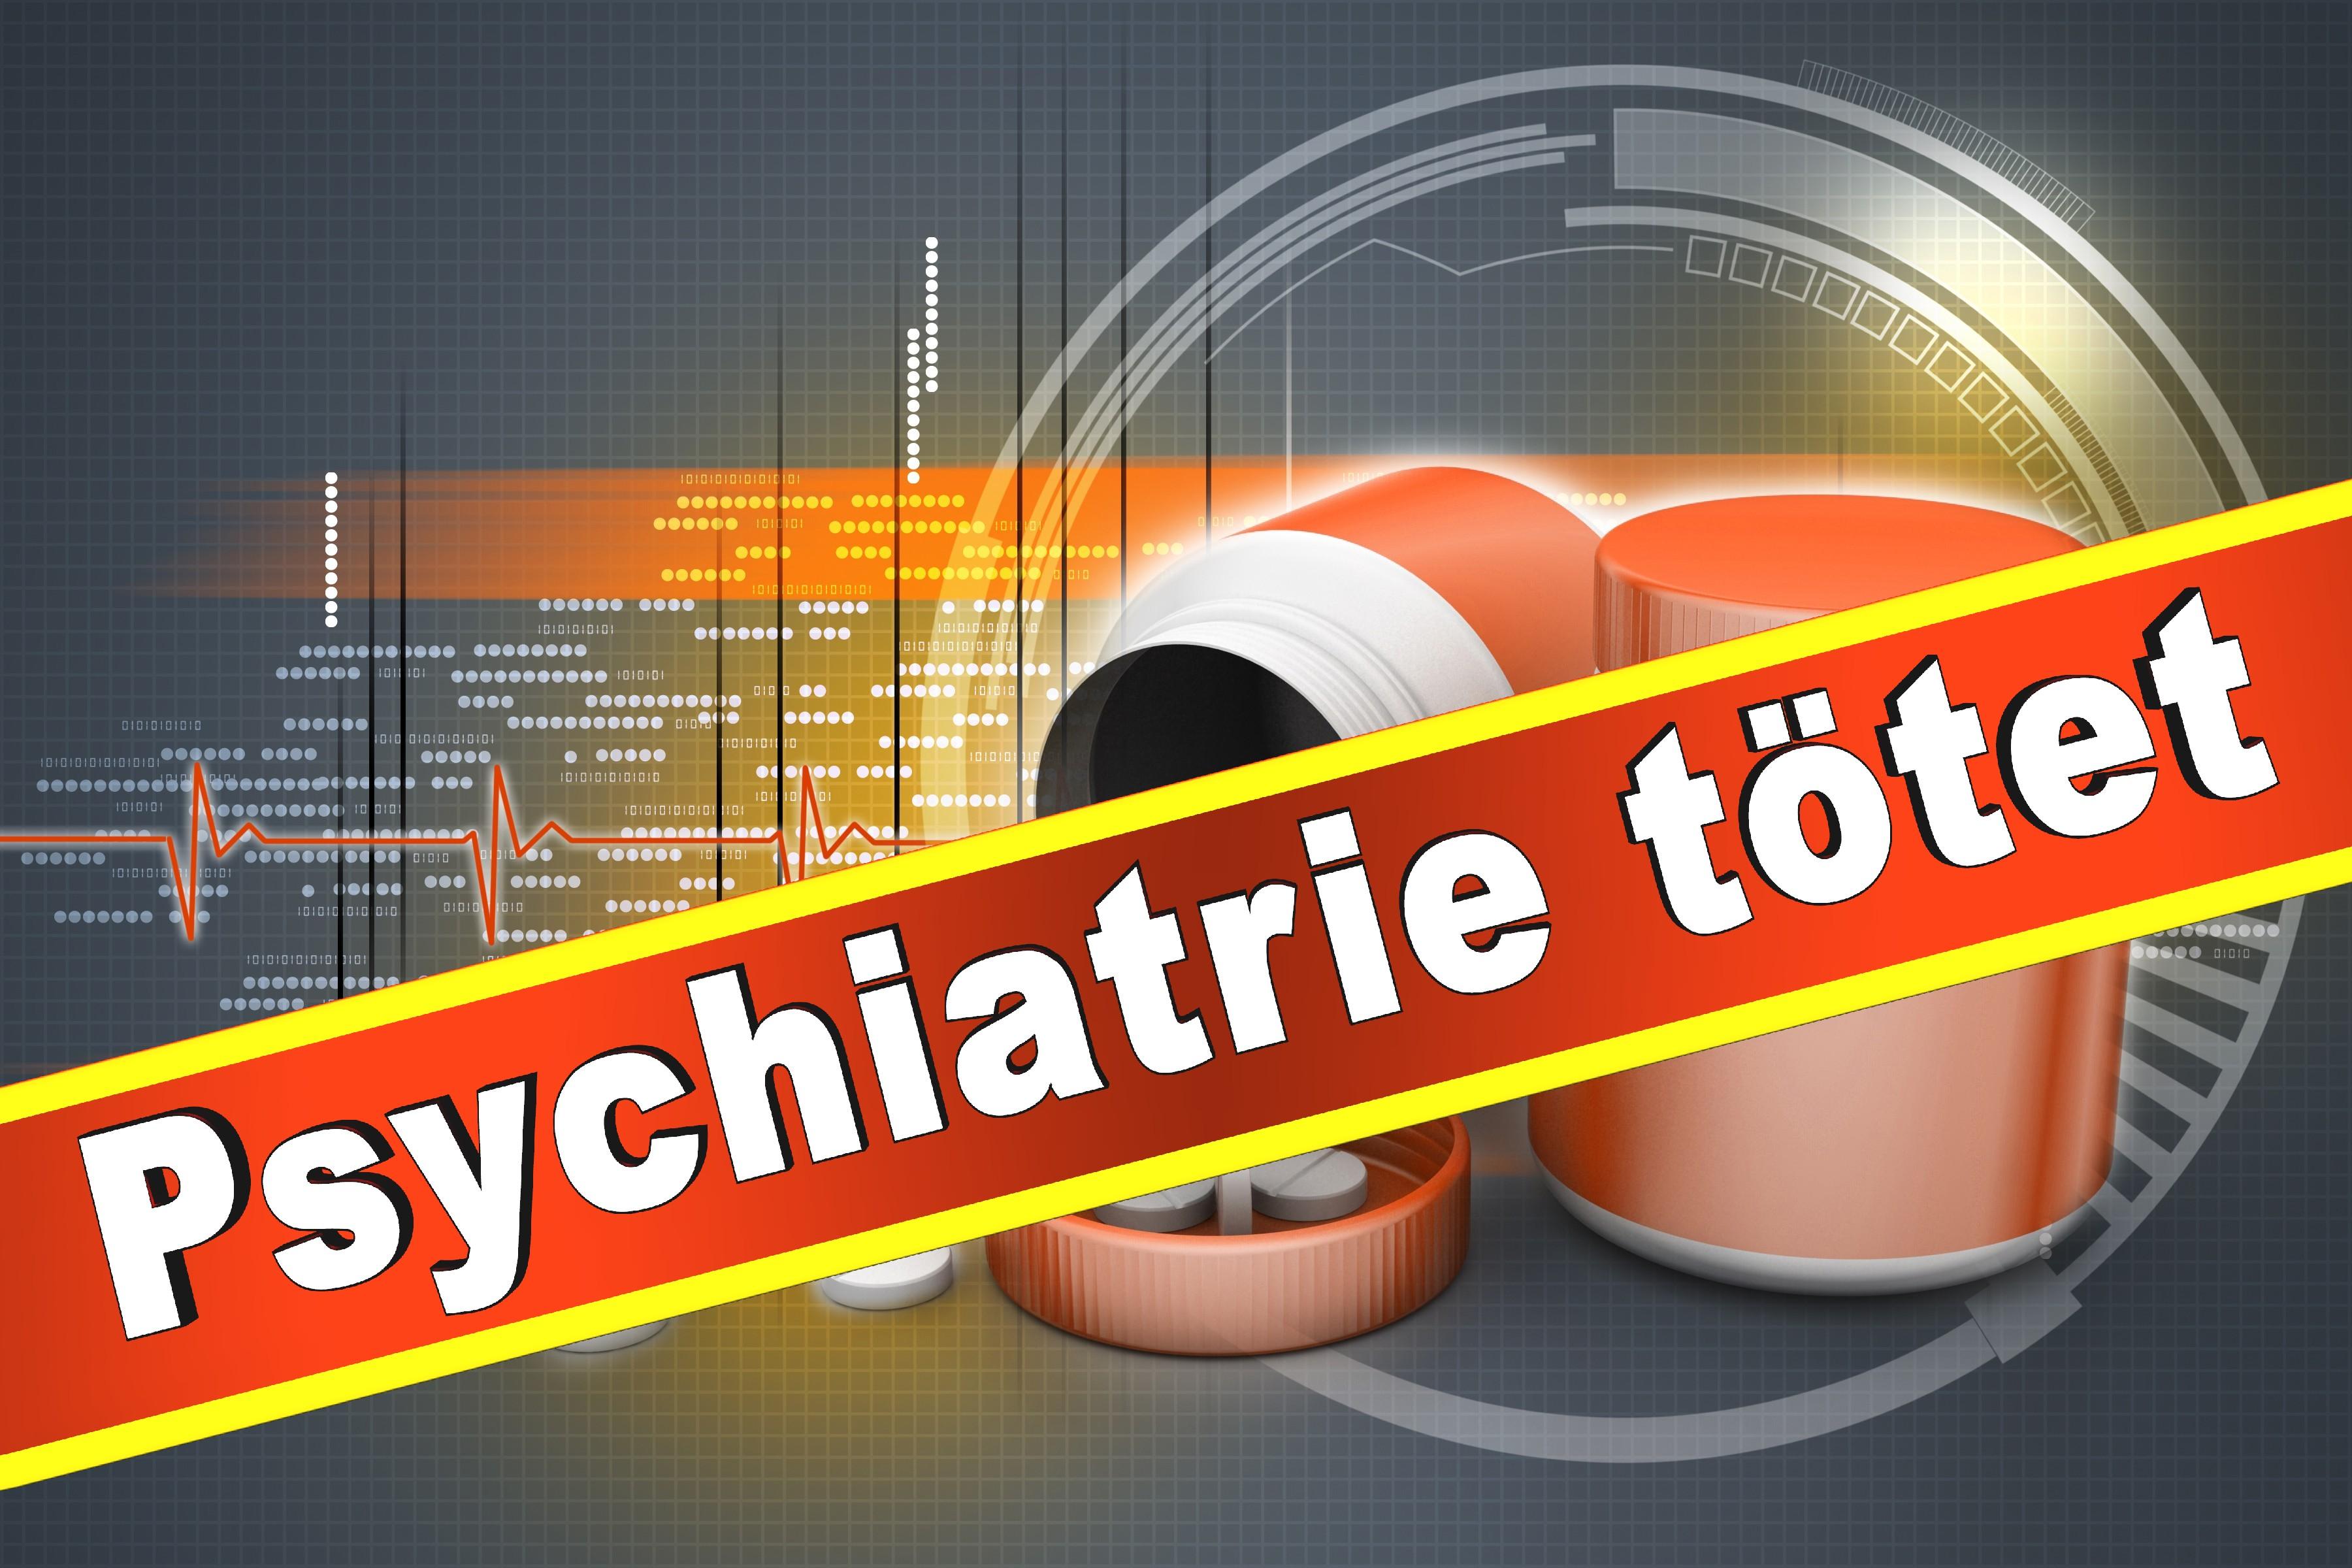 Dr med A Rieger Kinder Und Jugendpsychiatrie Psychiater Hannover Gutachten Psychiater Facharzt Psychiatrie